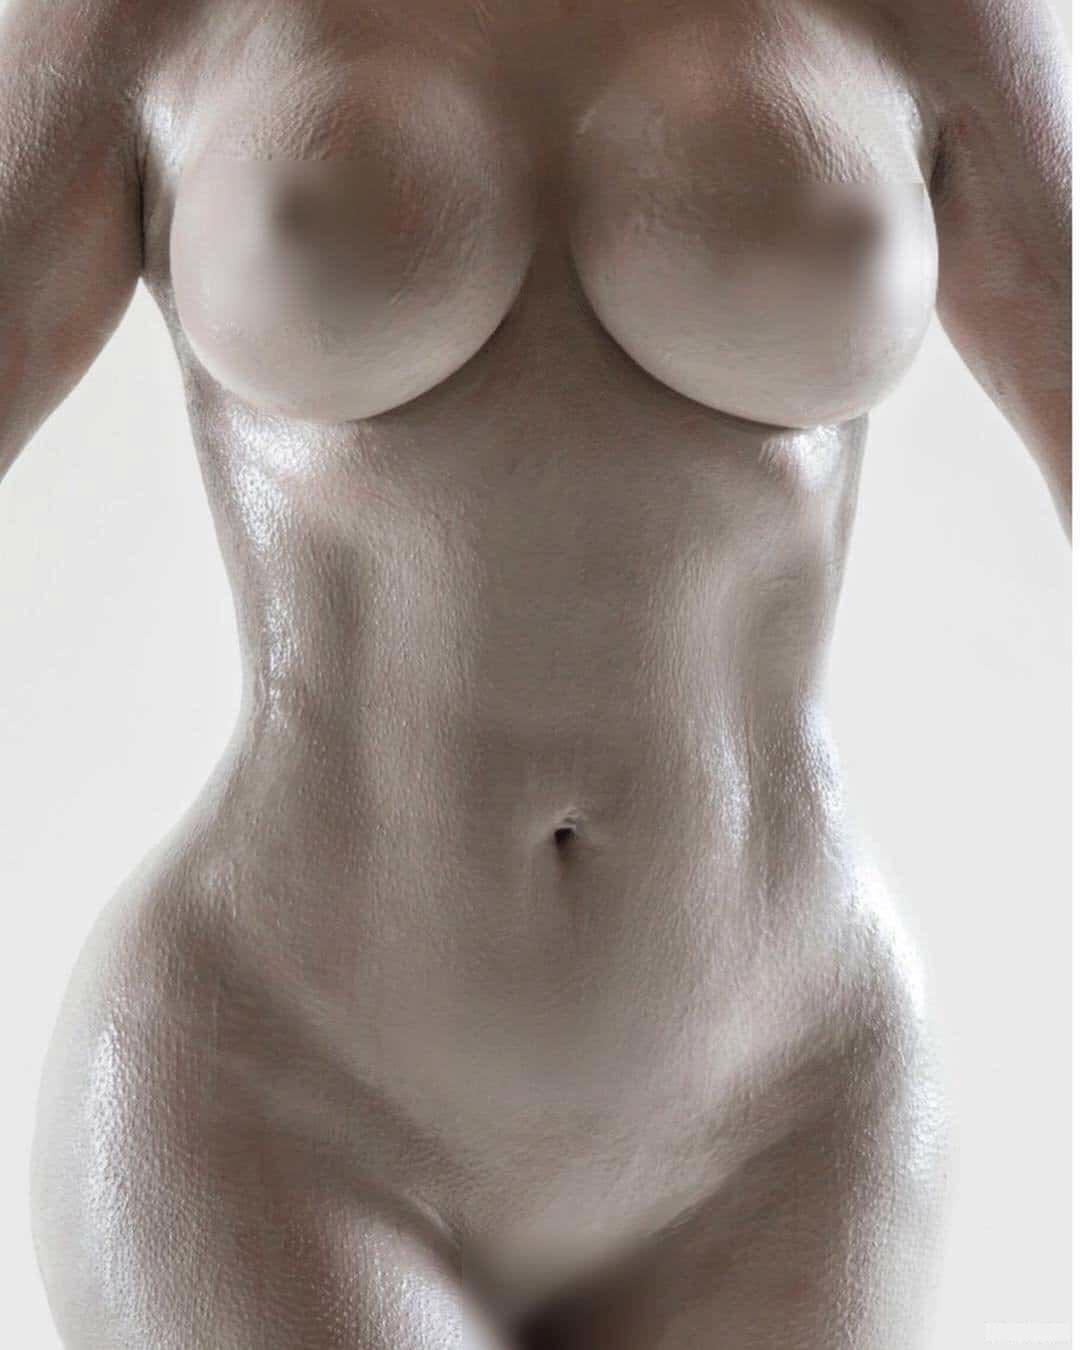 Kim Kardashian Nude Body Paint Set Leaked Wlwdhb